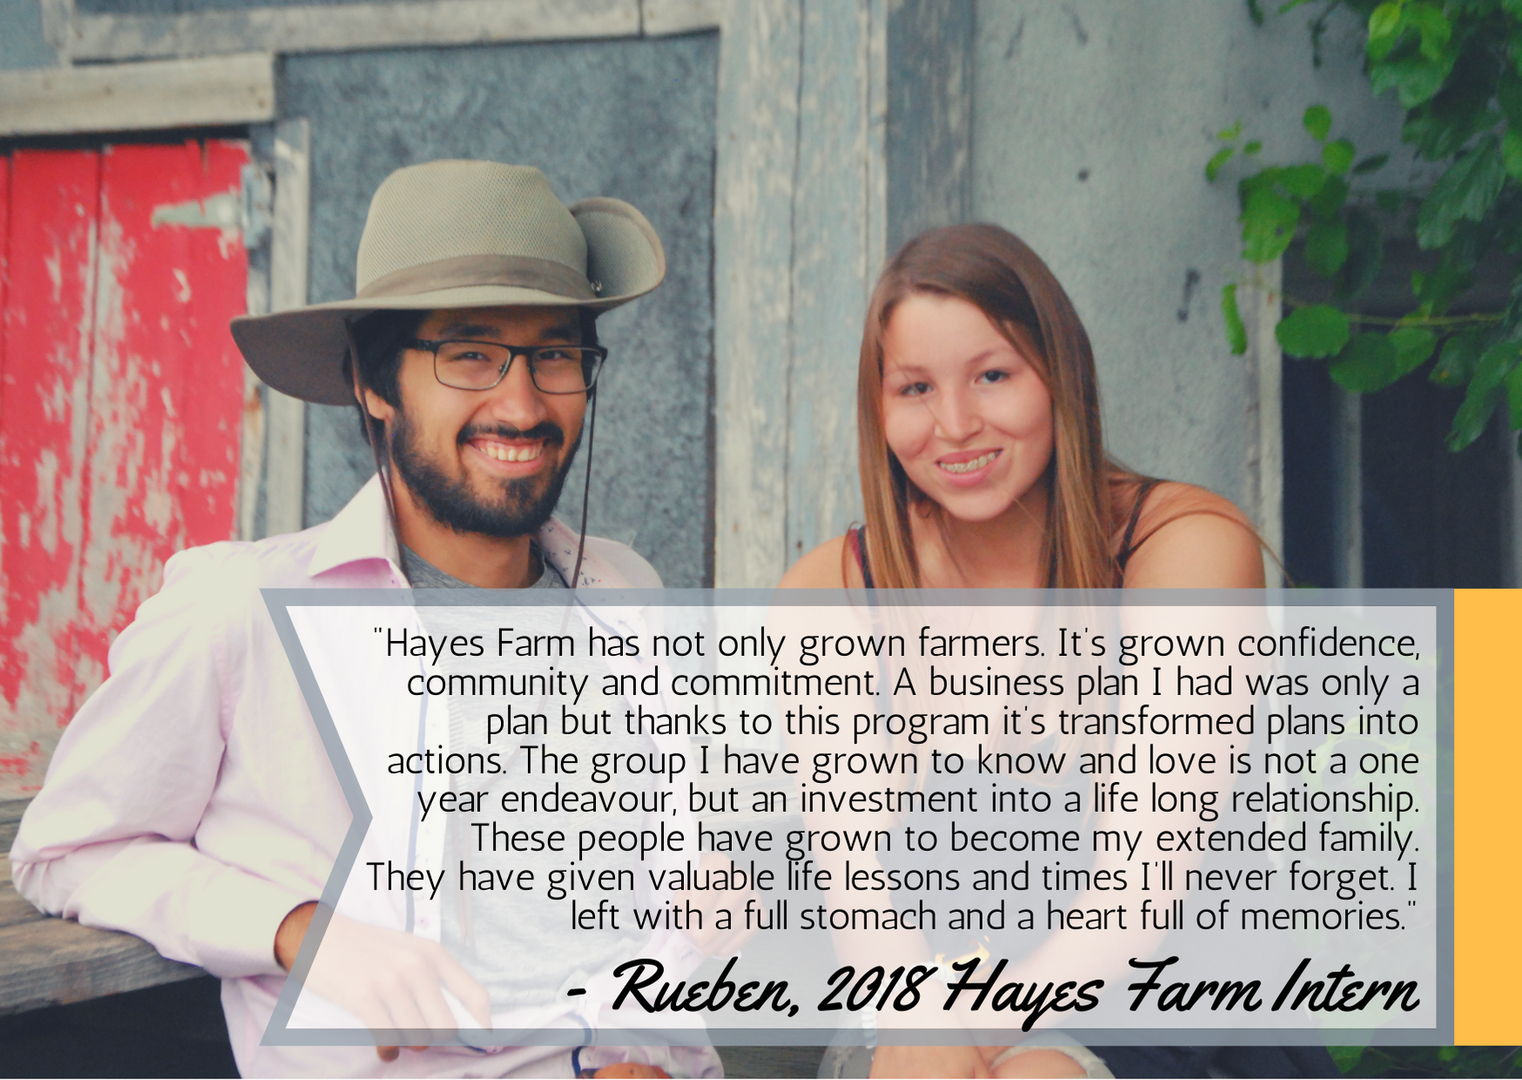 Rueben's testimonial